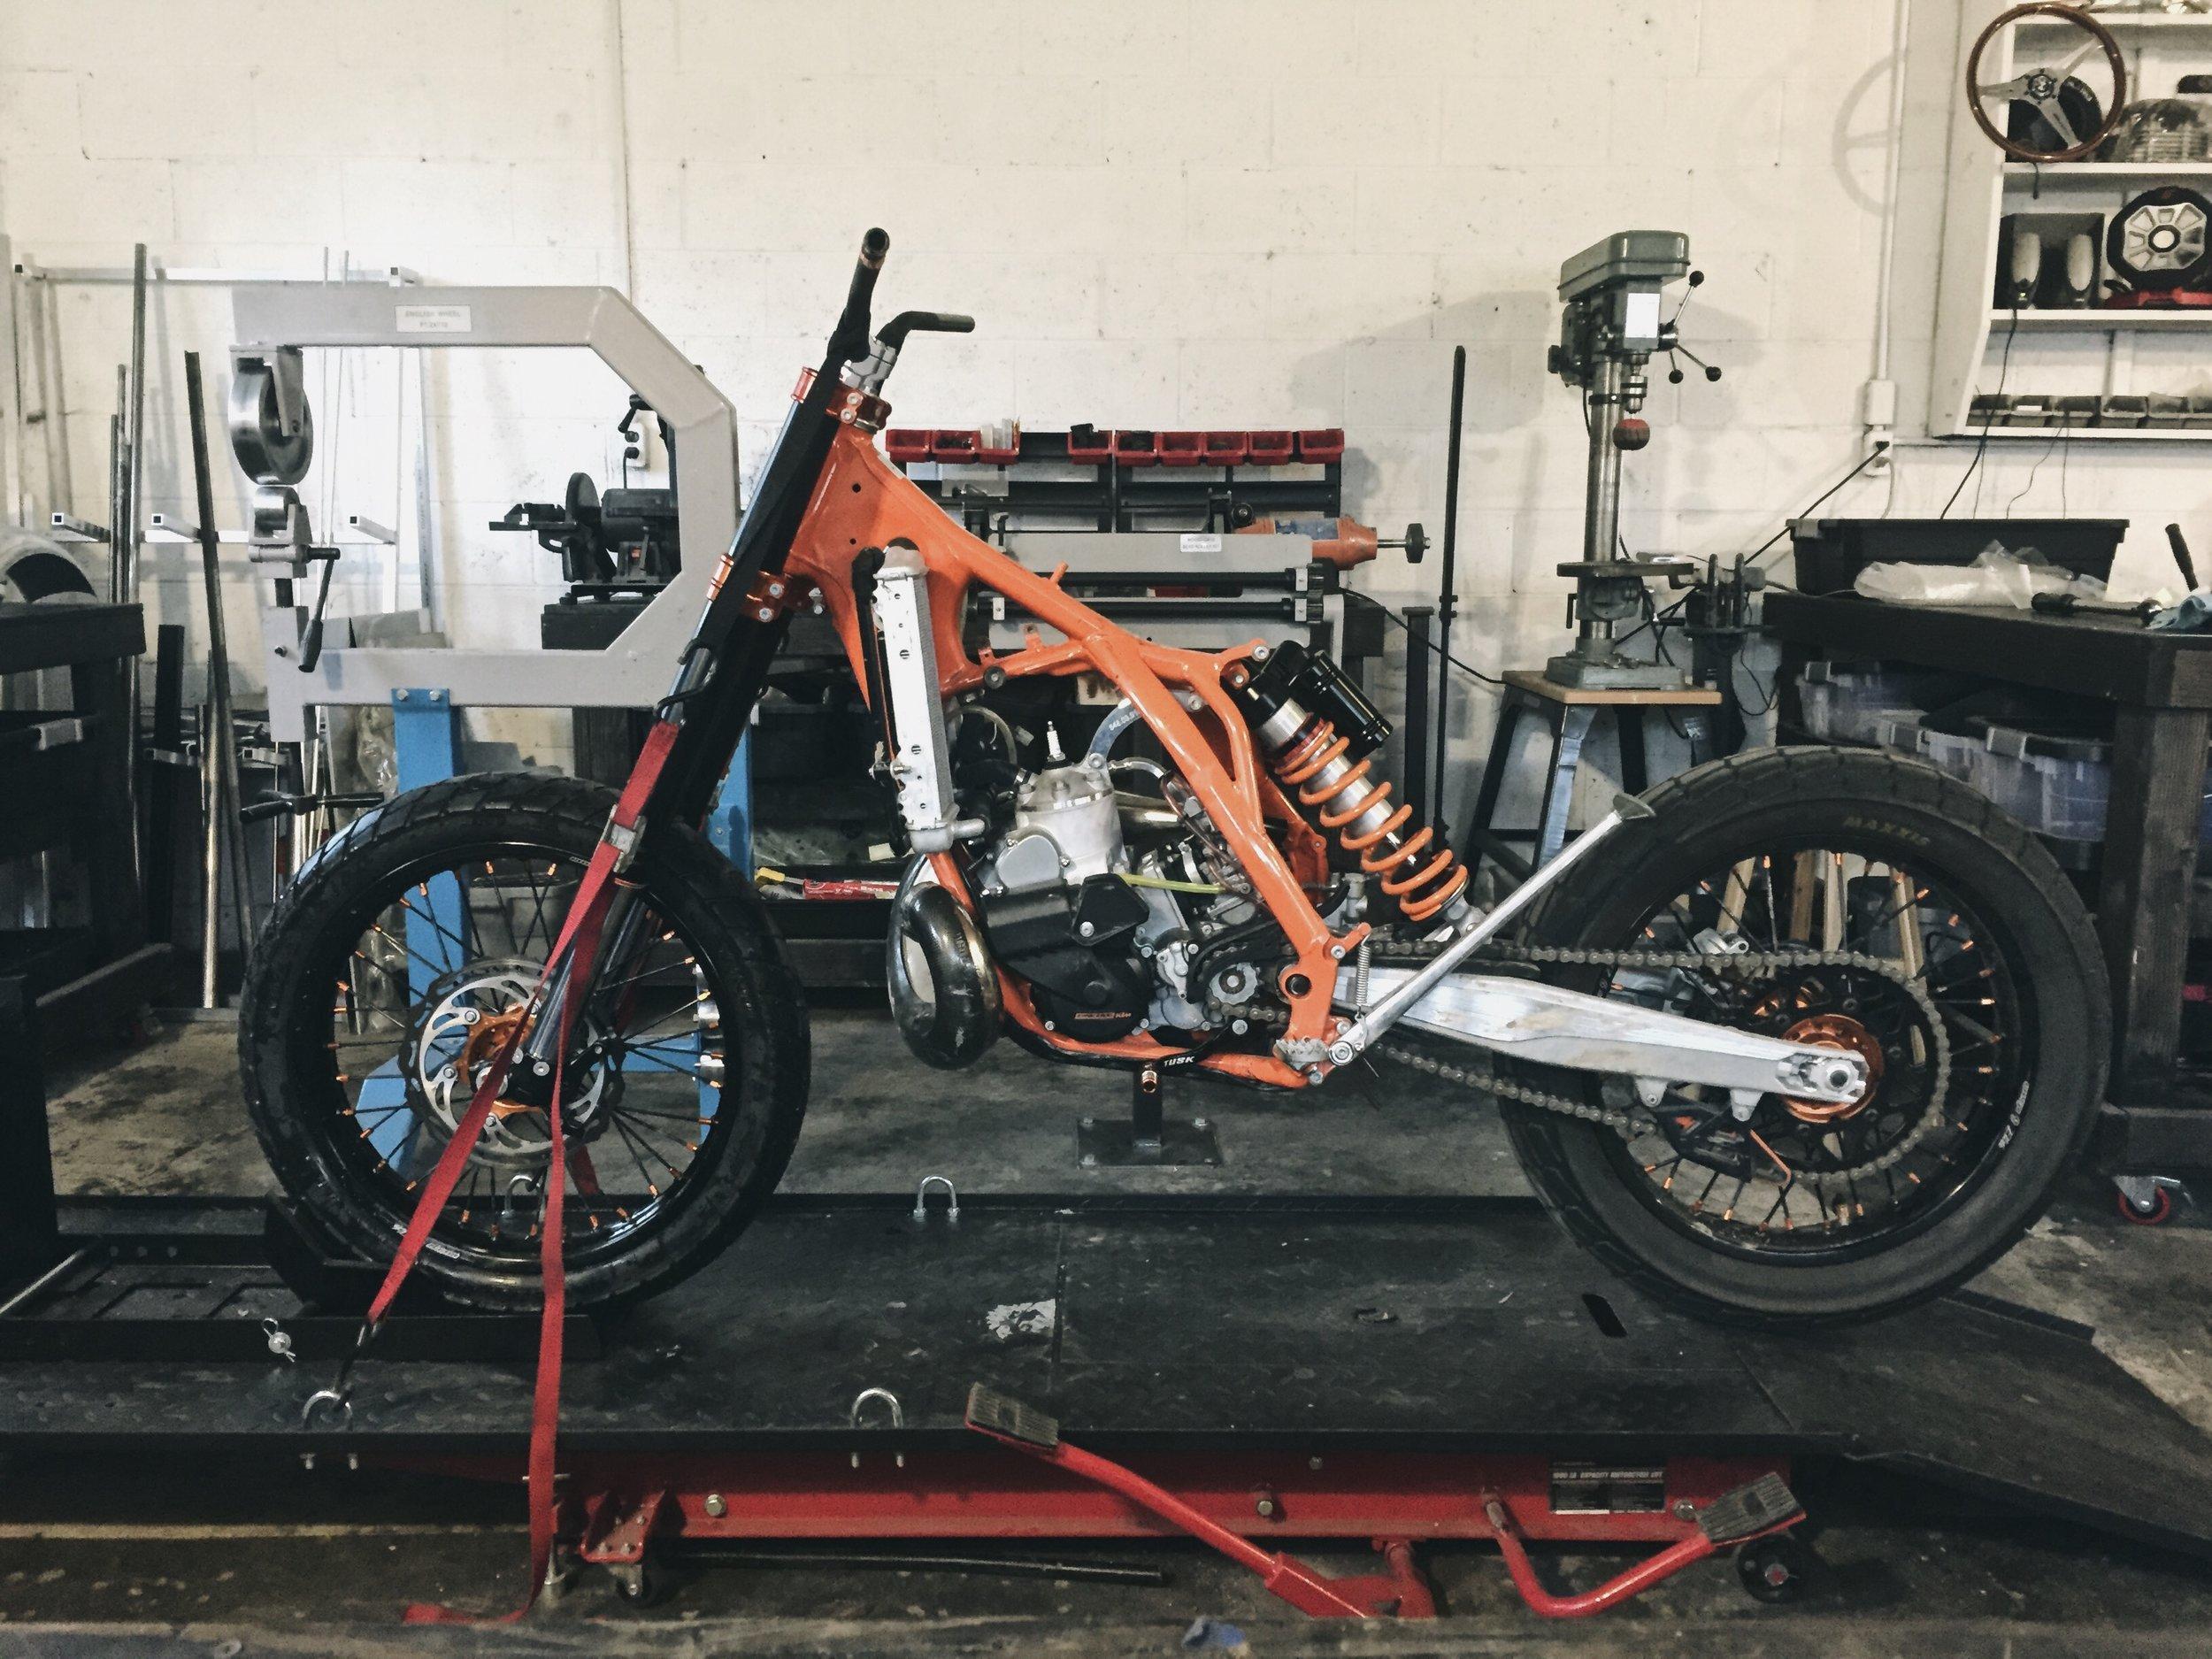 Moto-Mucci_Custom_KTM_300_Build (5).jpg